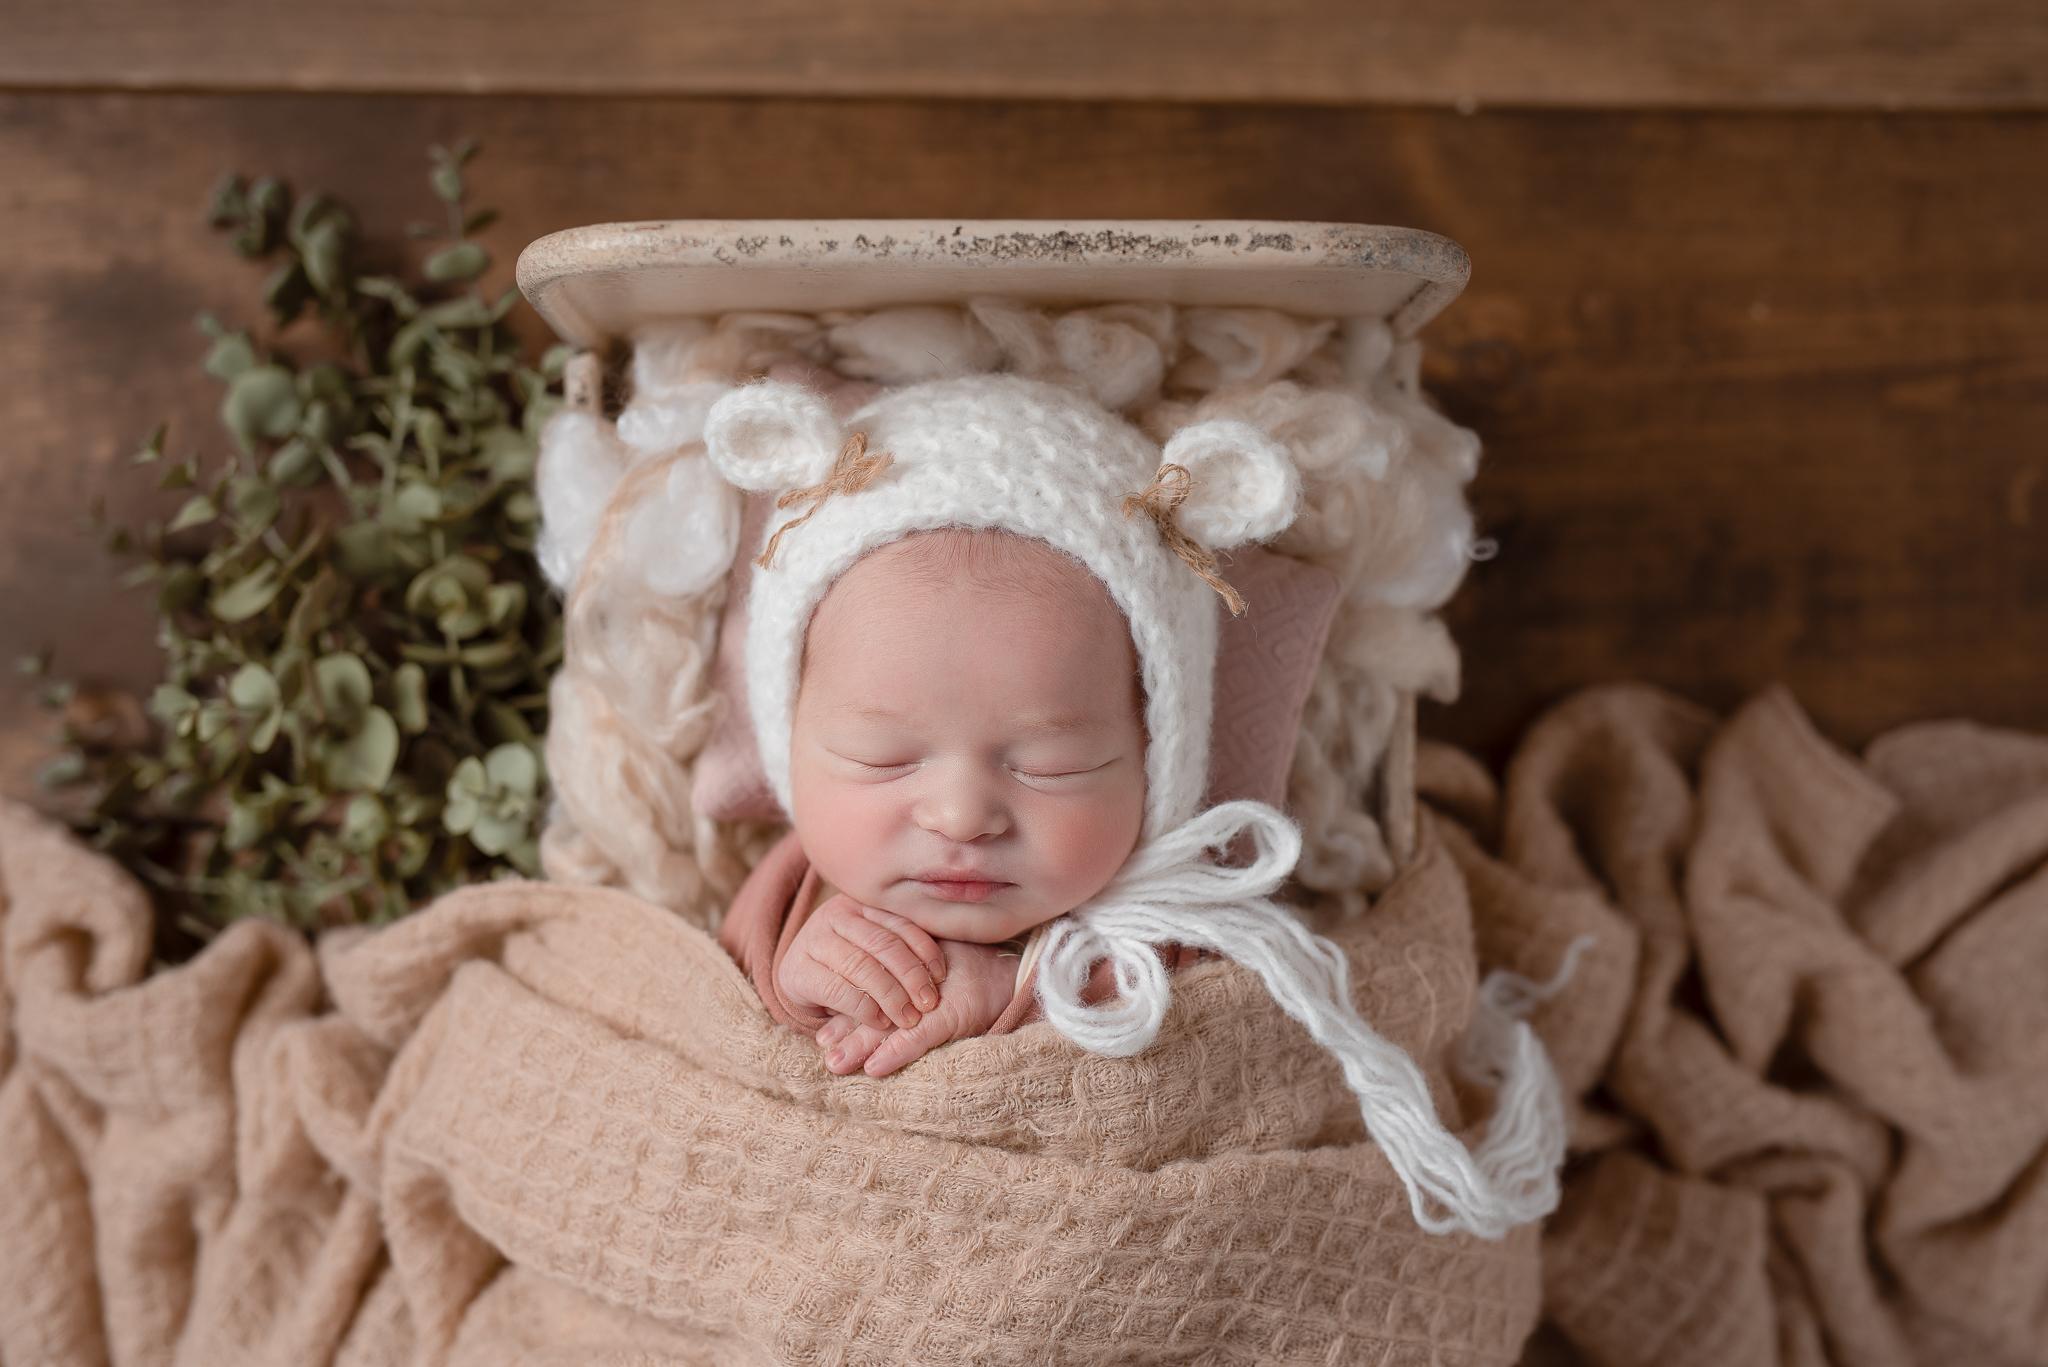 Newborn352NaomiLuciennePhotography032019-Edit.jpg